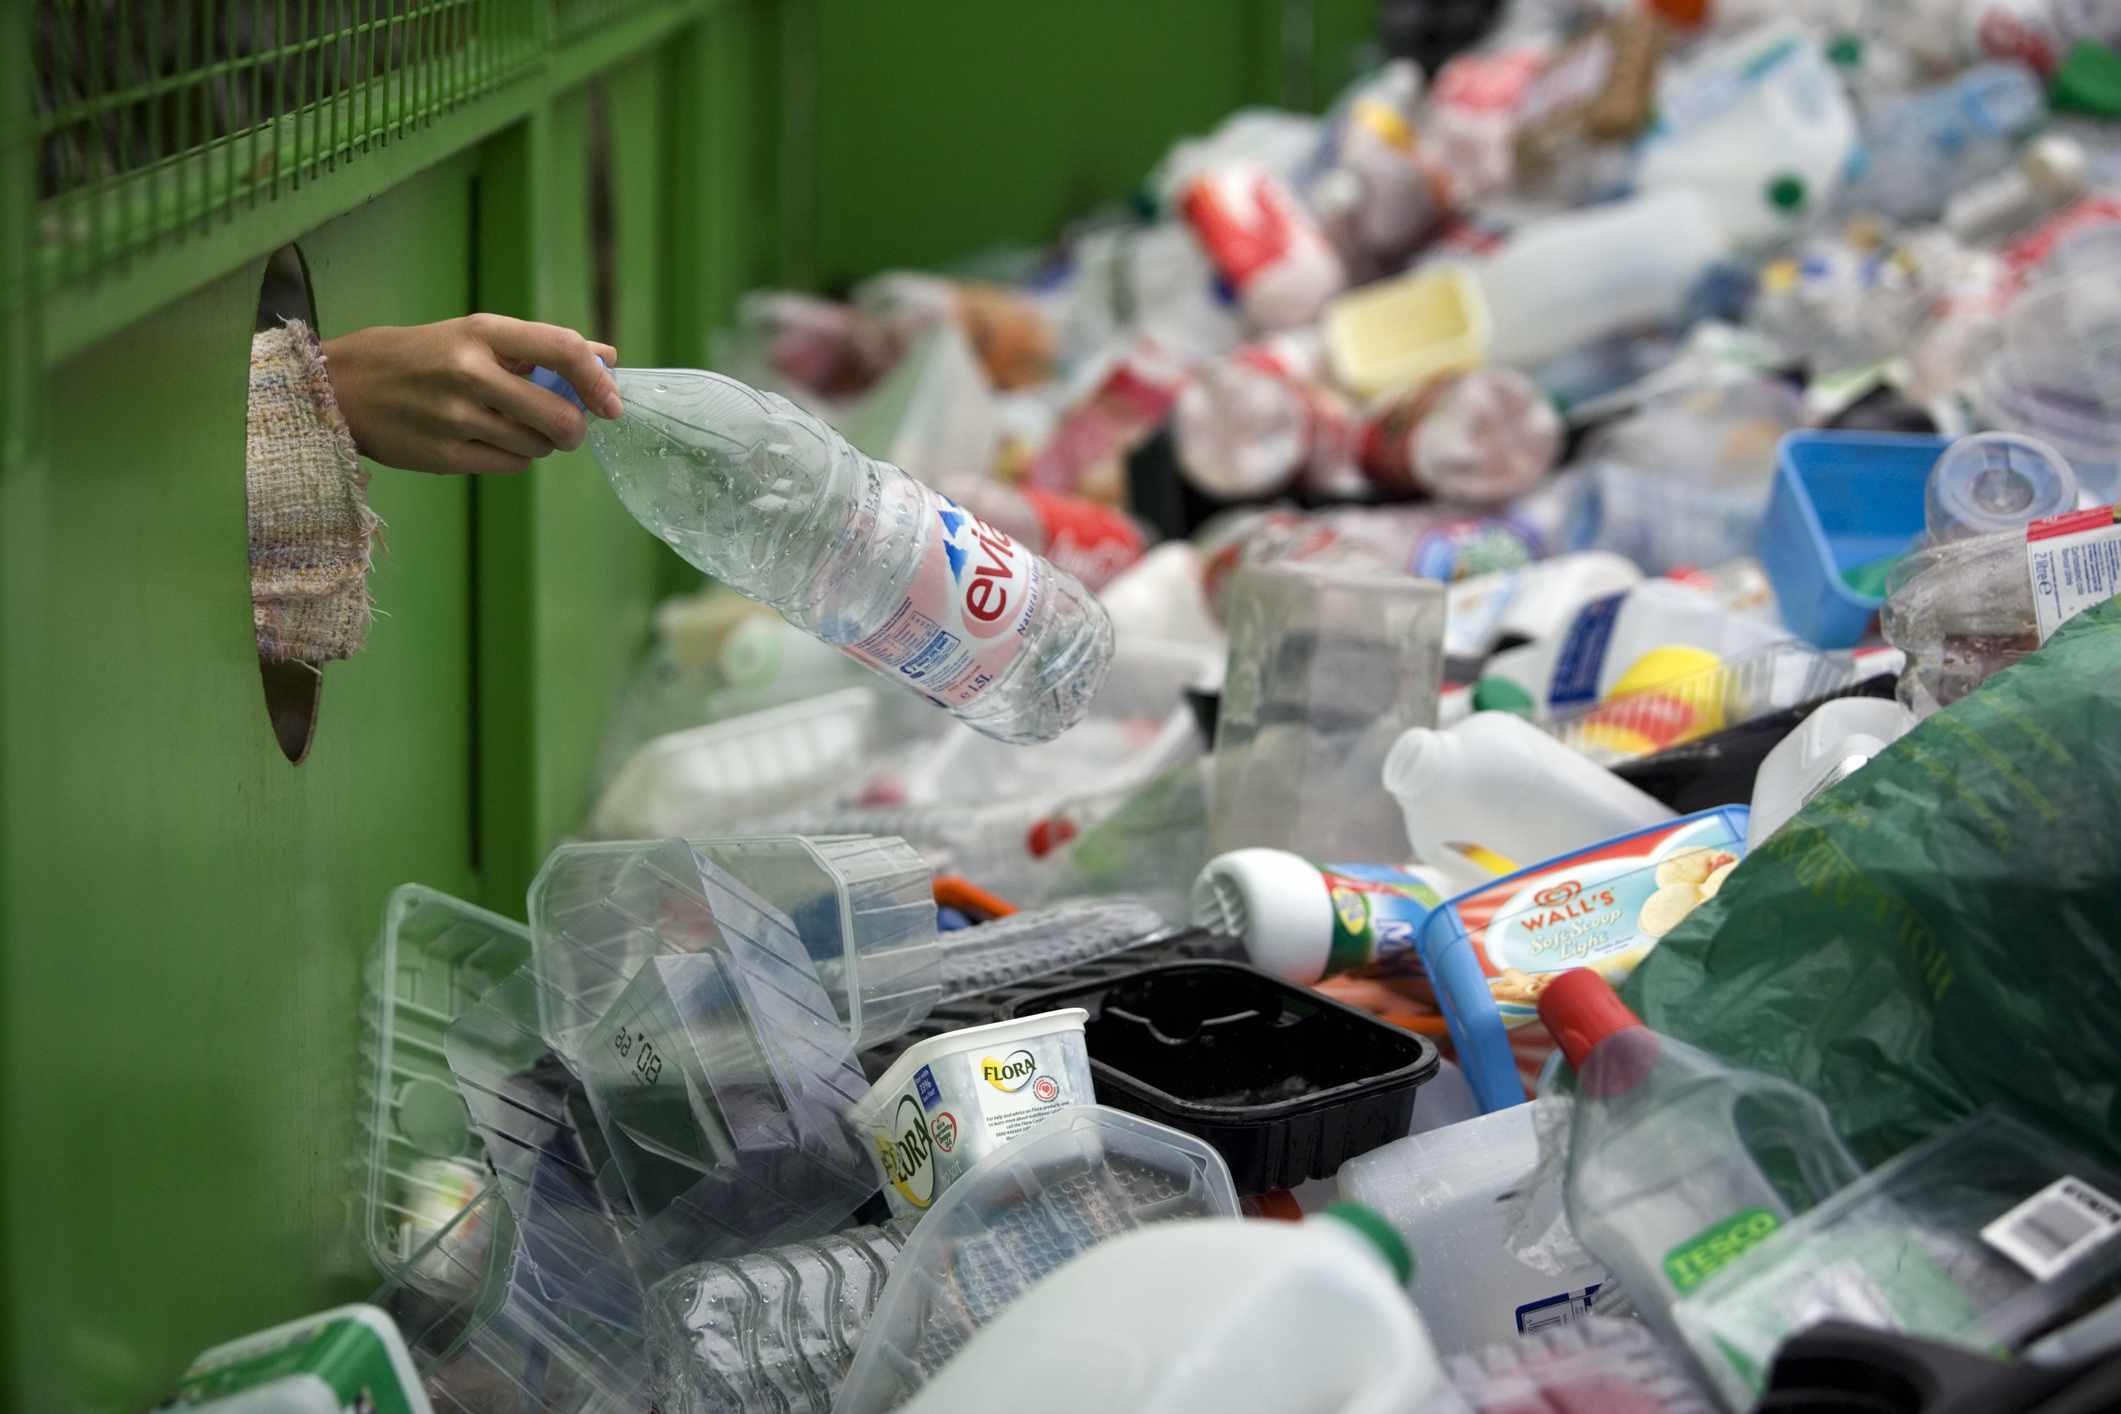 A hand puts a plastic bottle into a bin full of bottles.